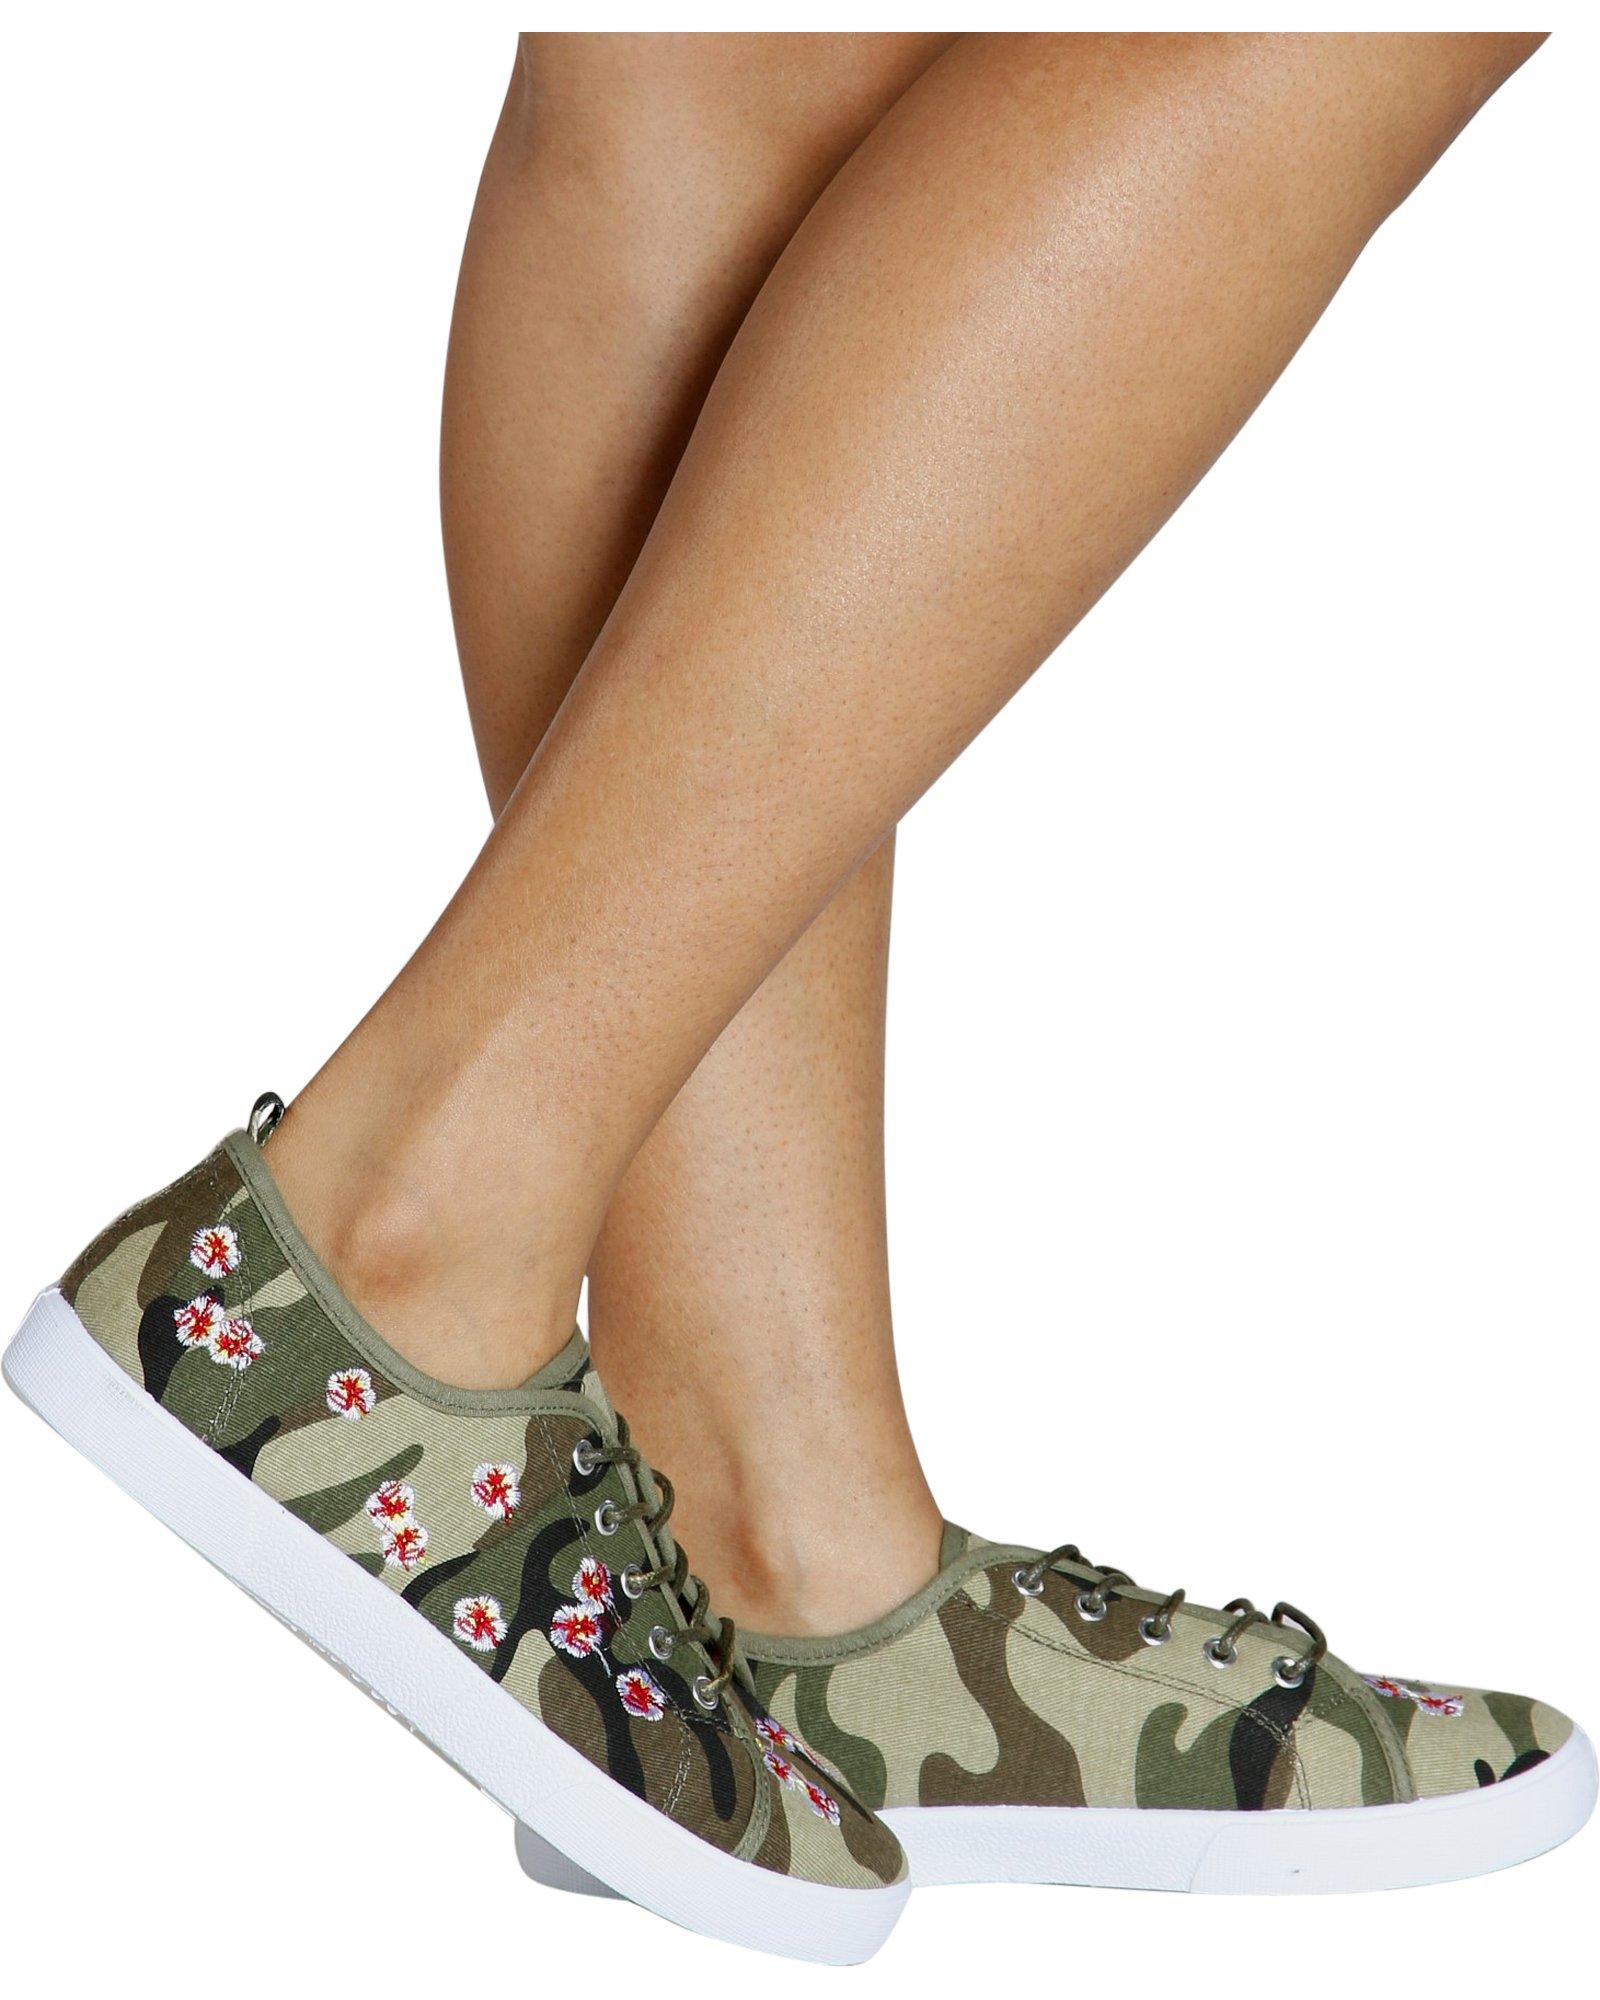 Love University Women's Time to Hide Embroidered Fashion Sneaker - Camo,Camo,7